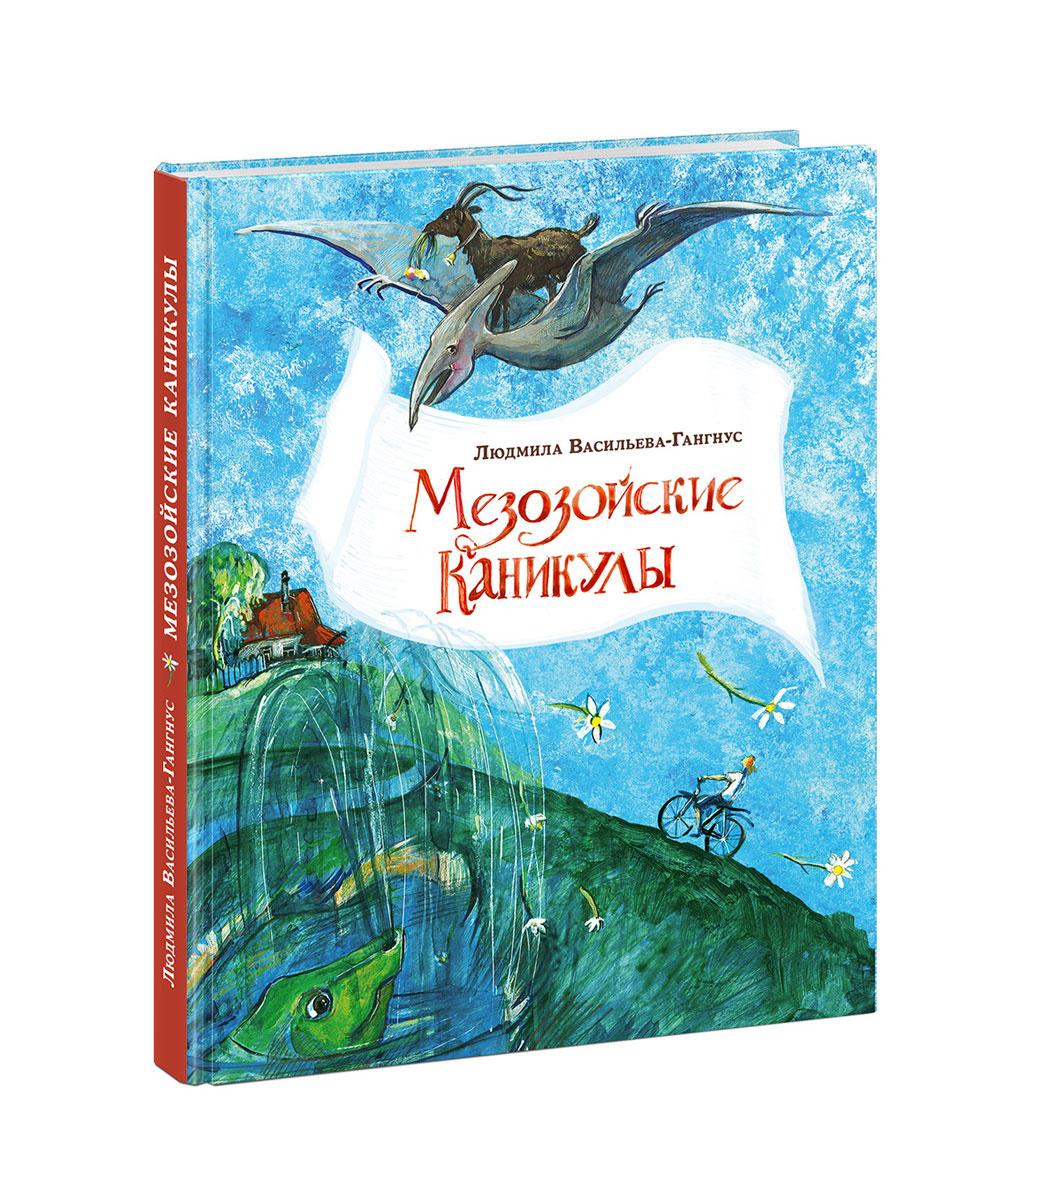 Мезозойские каникулы | Васильева-Гангнус Людмила Петровна  #1